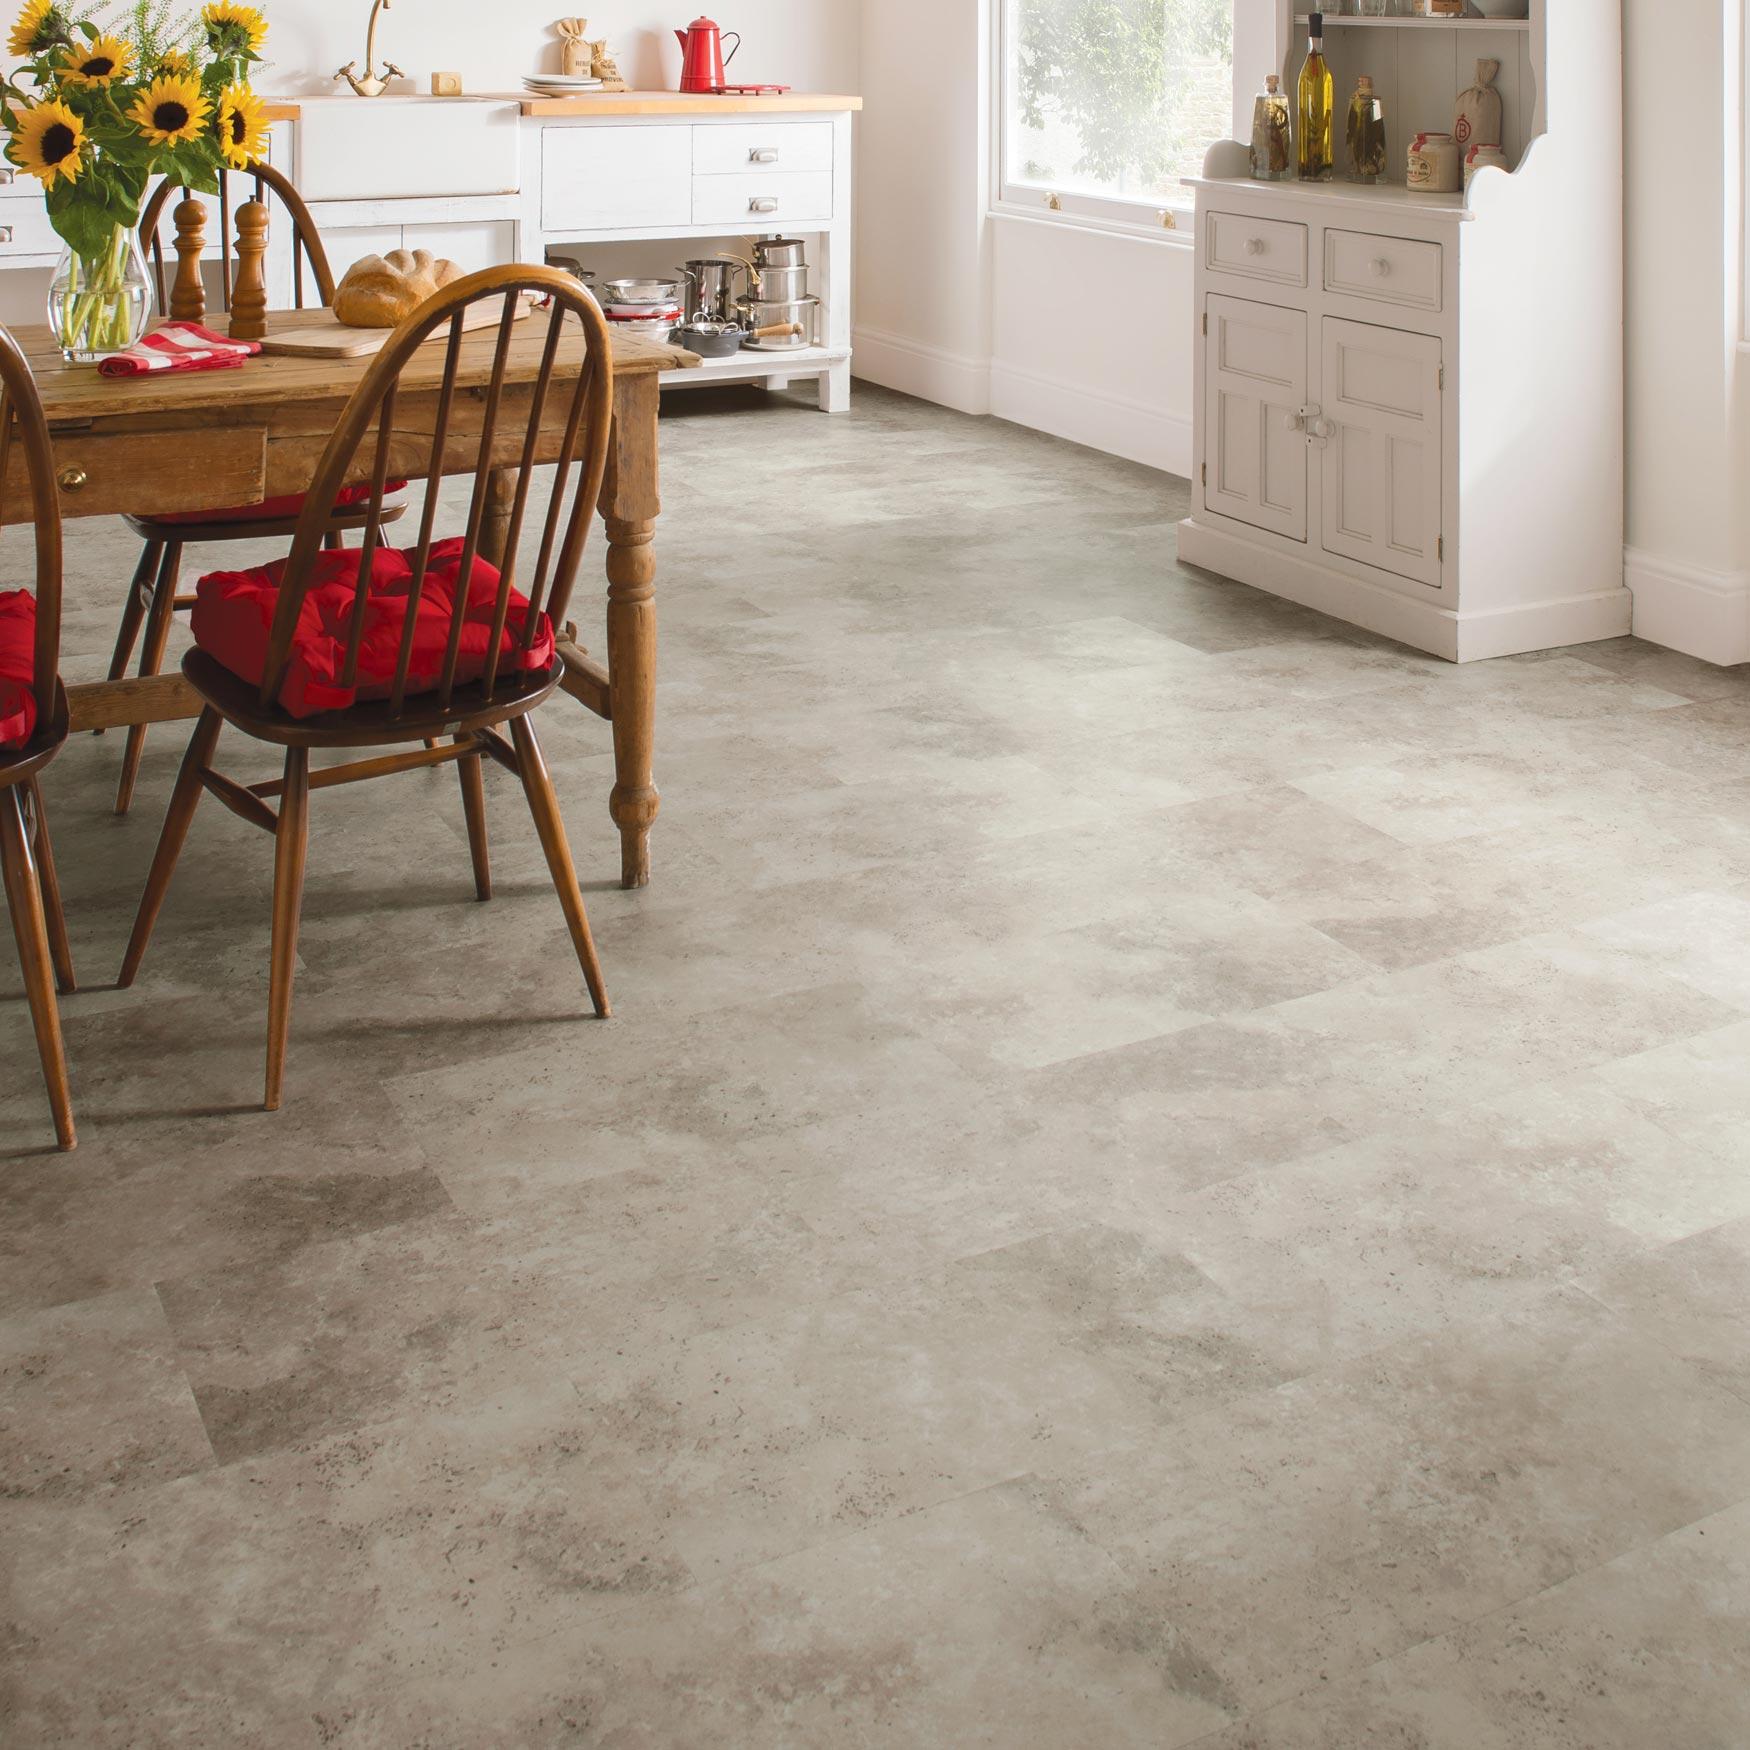 karndean flooring karndean palio pienza ct4303 clic vinyl tile ... HEPNYSA